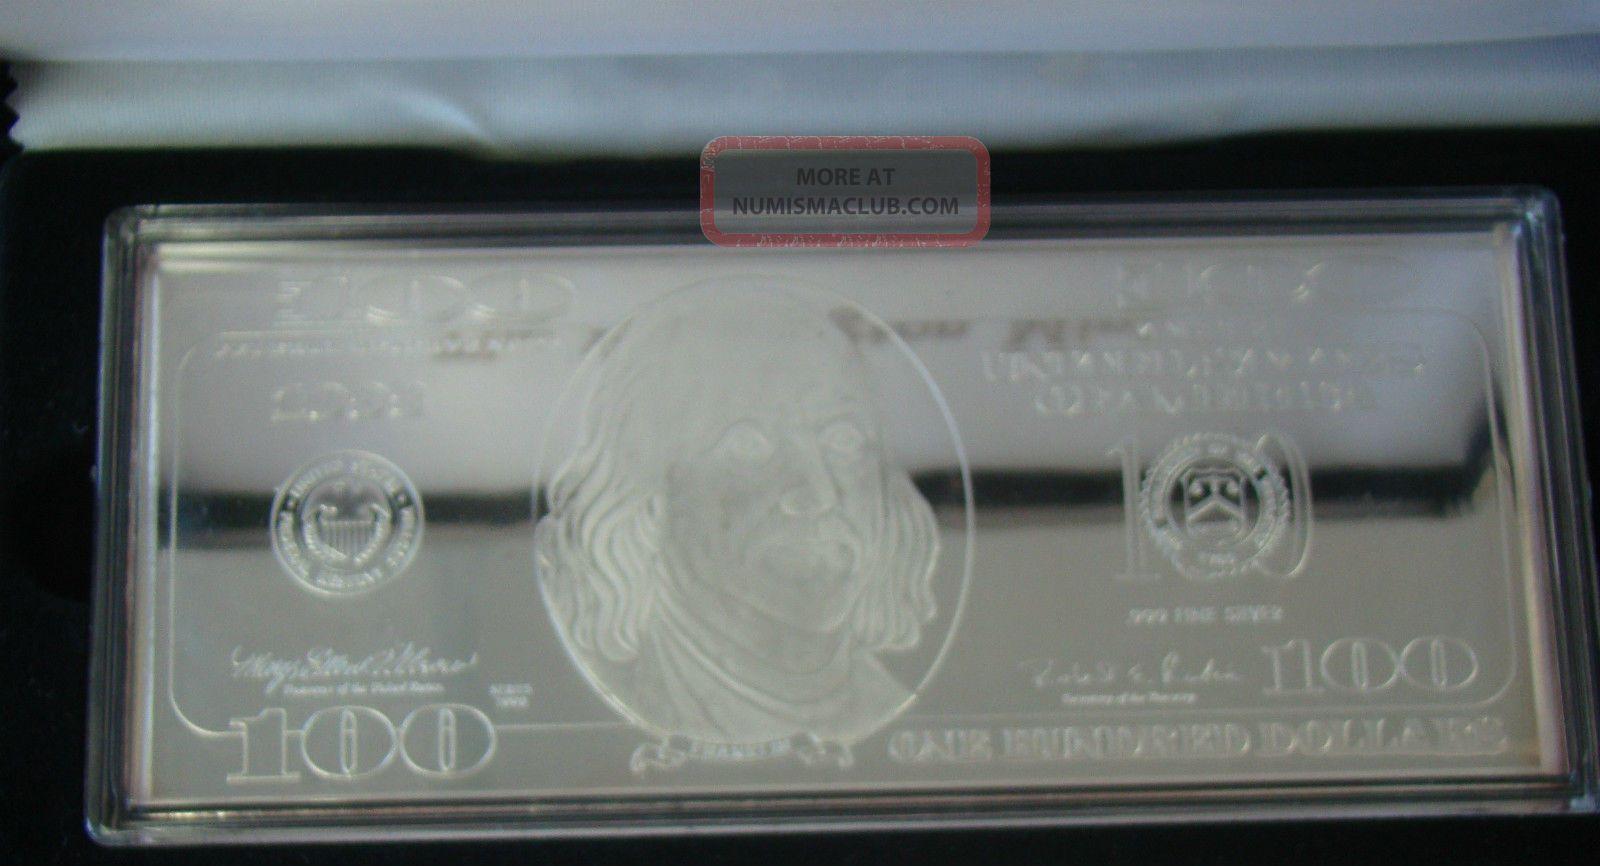 1998 Washington 999 Fine Silver 1 Quarter Pound Proof